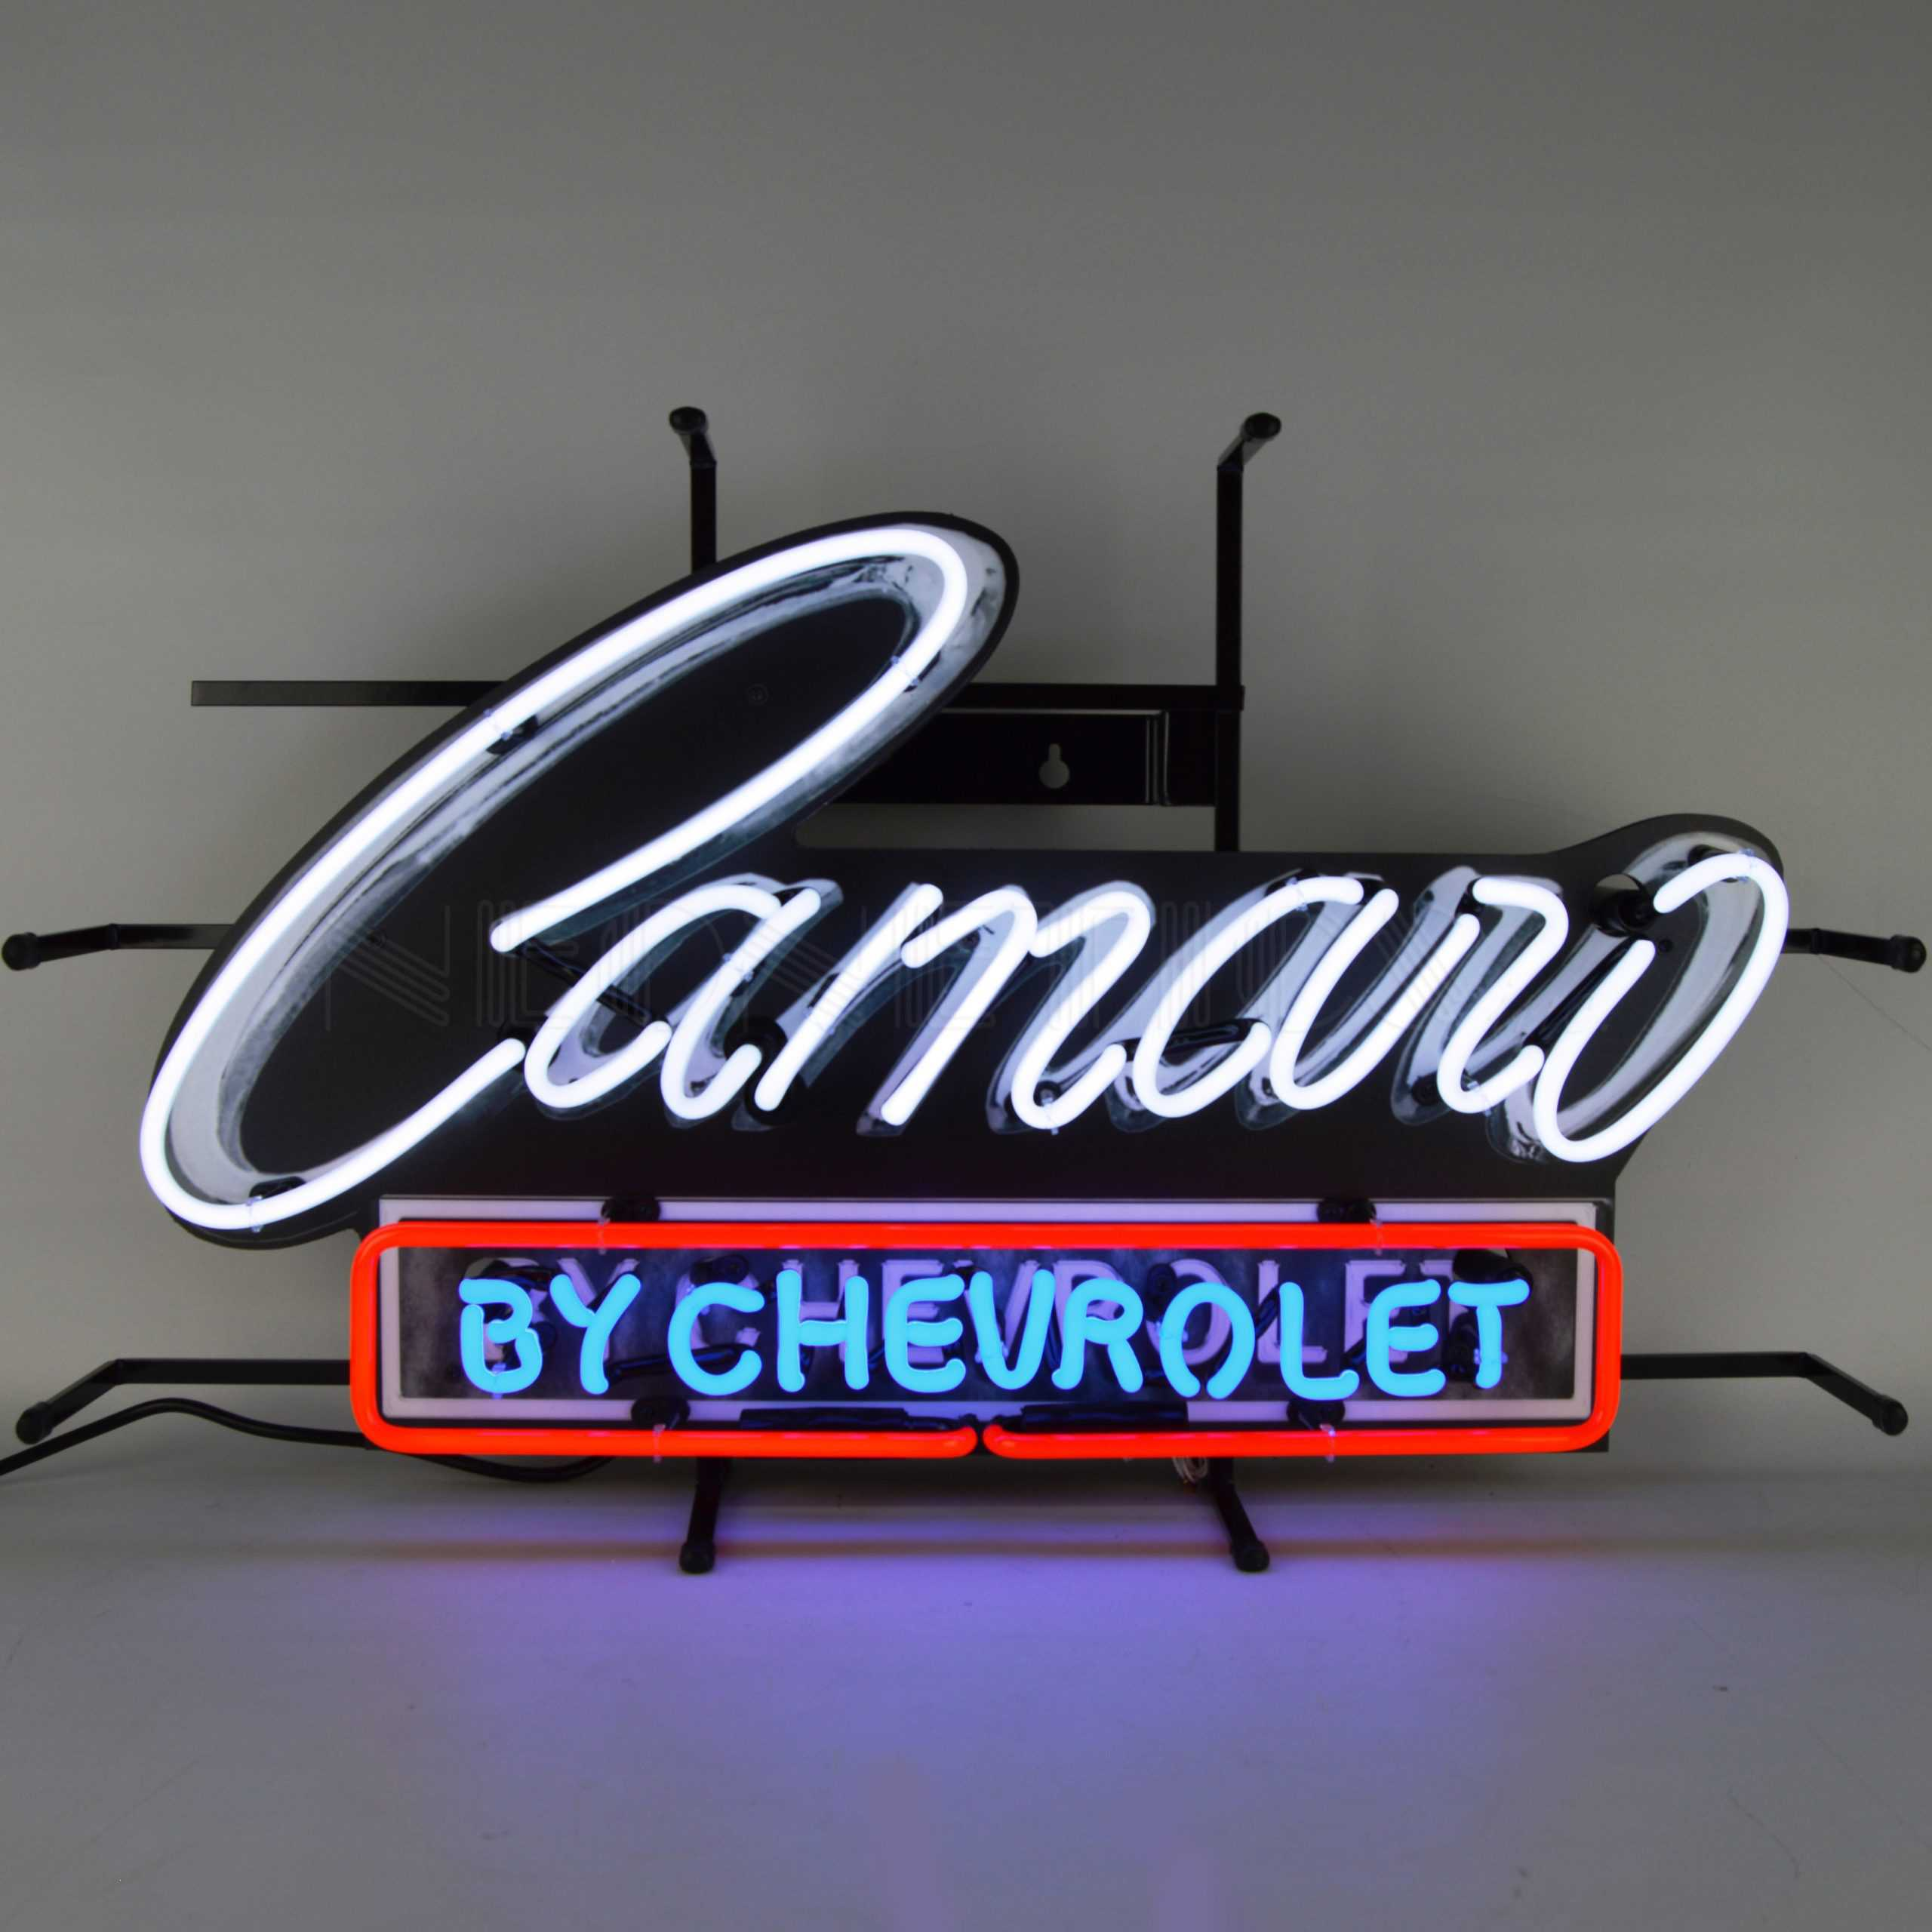 CAMARO BY CHEVROLET NEON SIGN